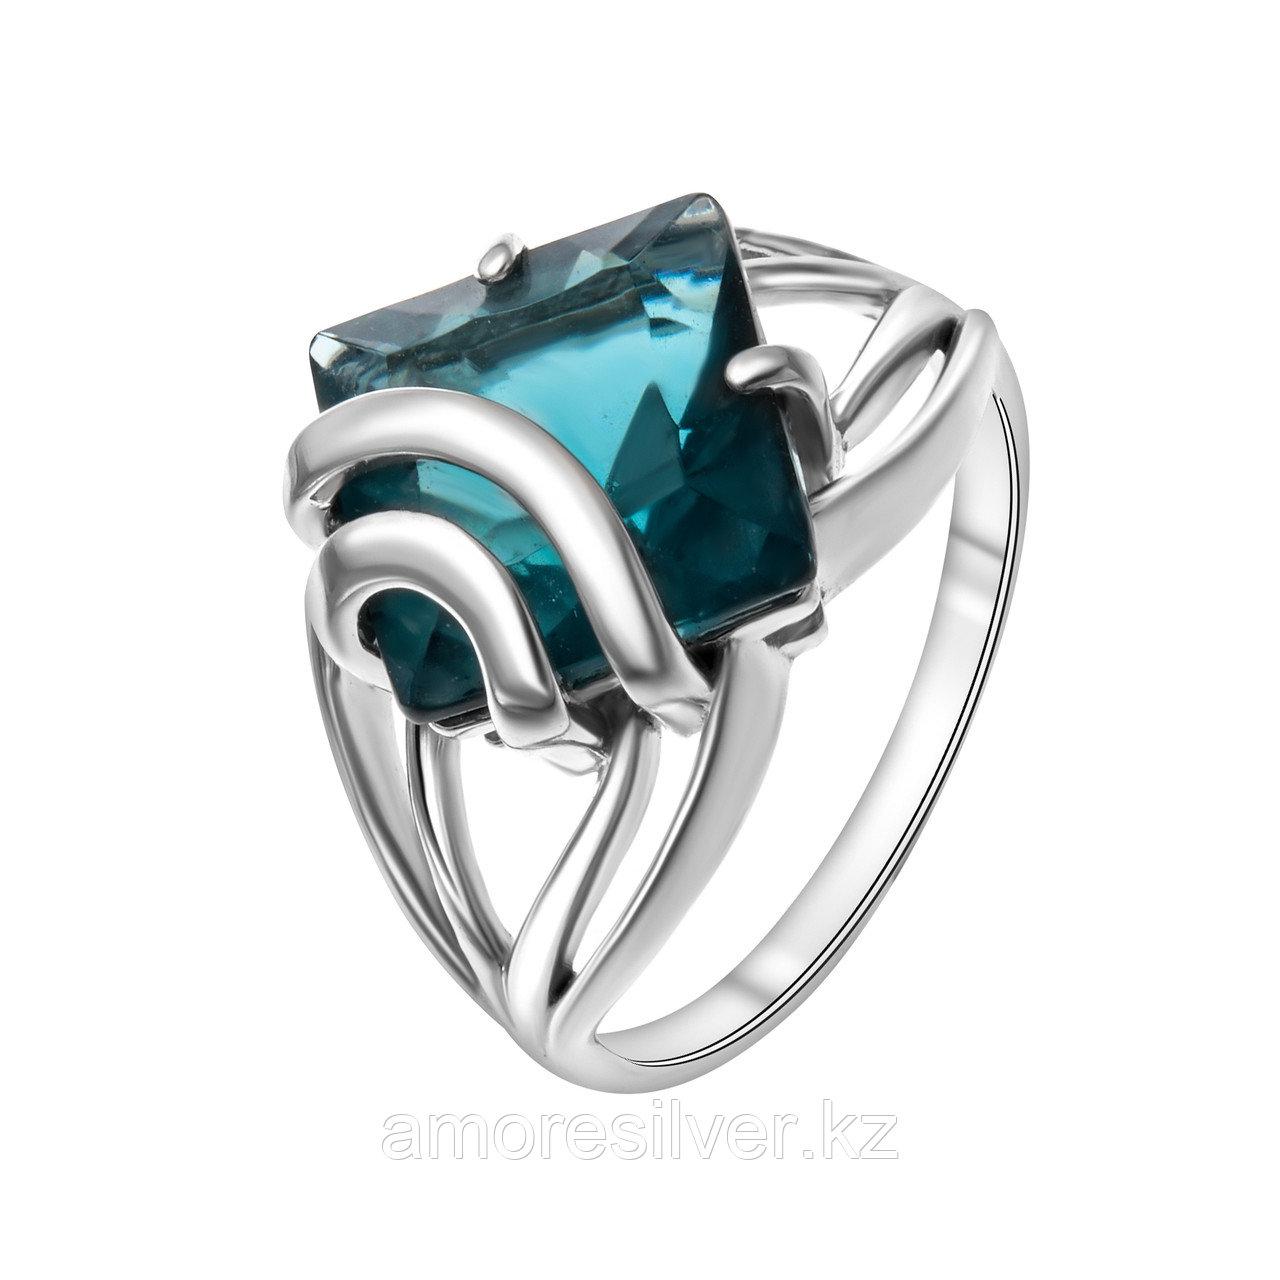 "Кольцо Алмаз-Групп серебро с родием, кварц пл. топаз лондон, ""каратник"" 11390032"